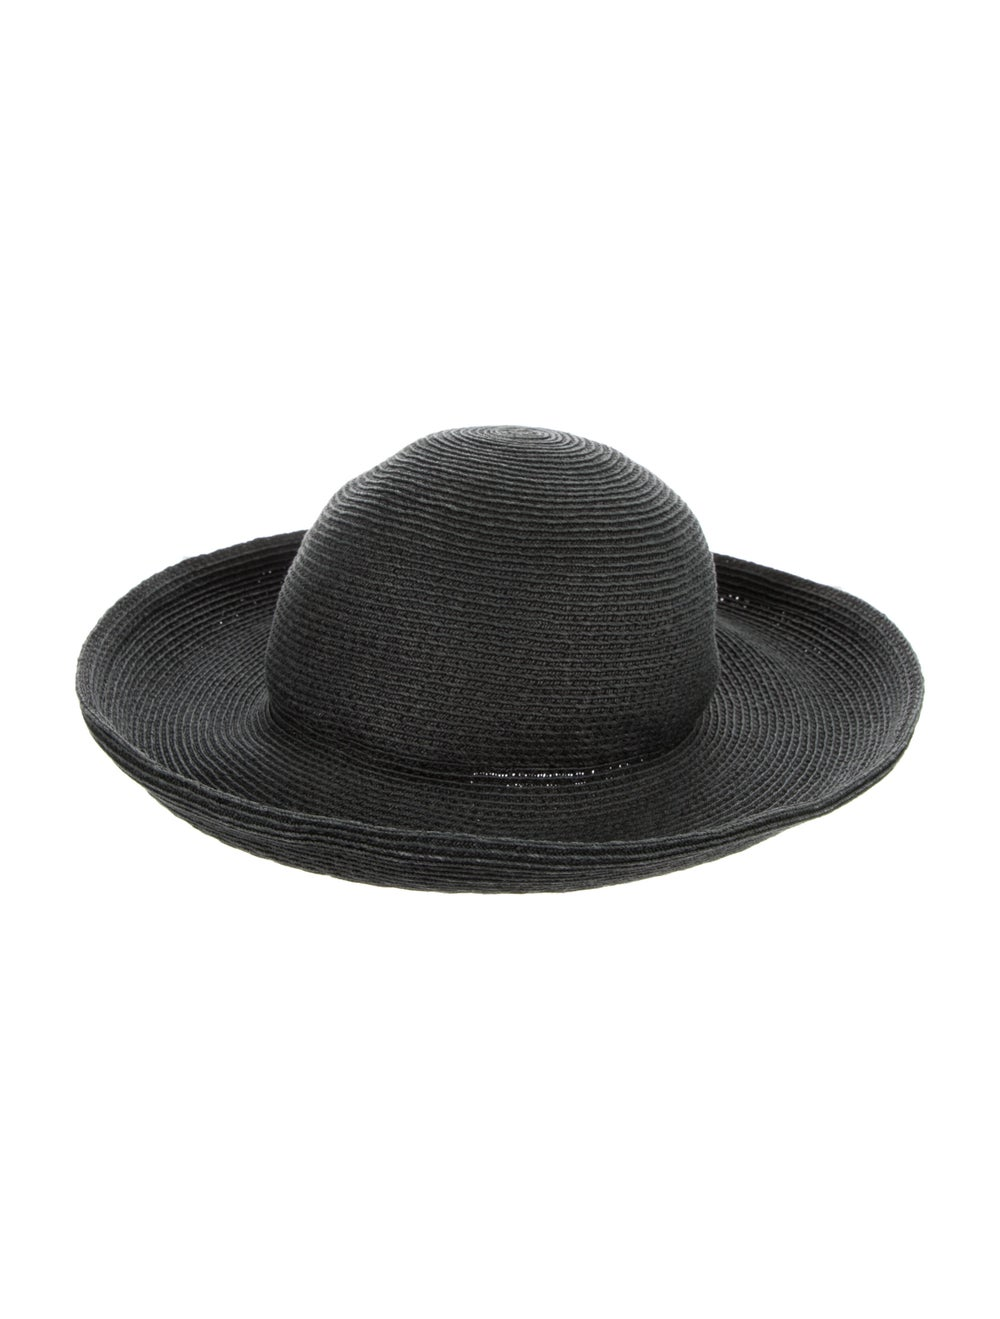 Eric Javits Straw Floppy Hat - image 2